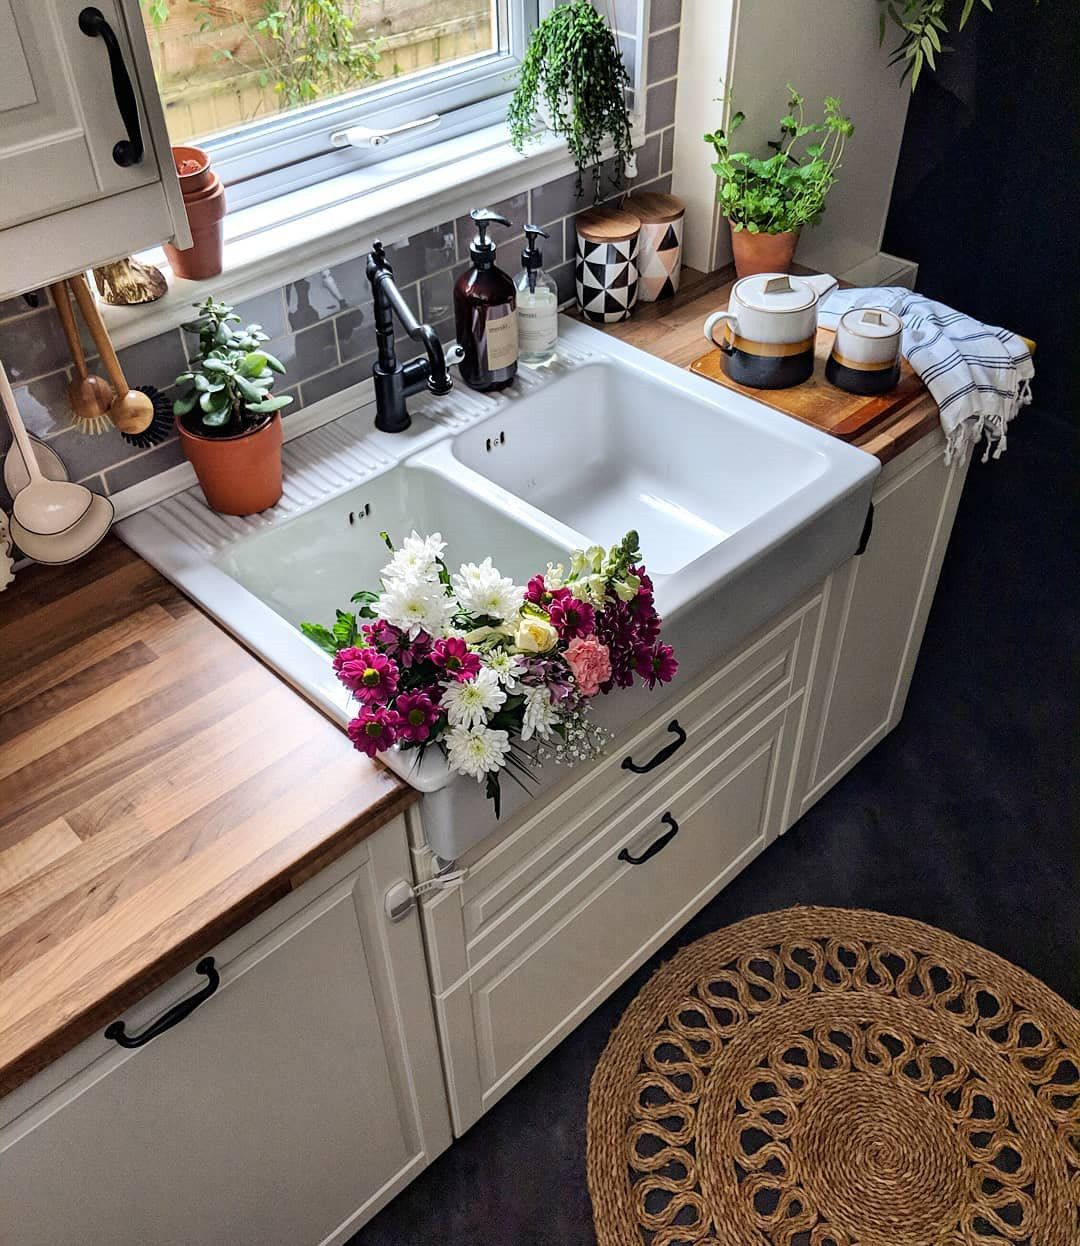 Interior Design For Very Small Kitchen: 60+ Small Kitchen Design Ideas To Make Your Home More